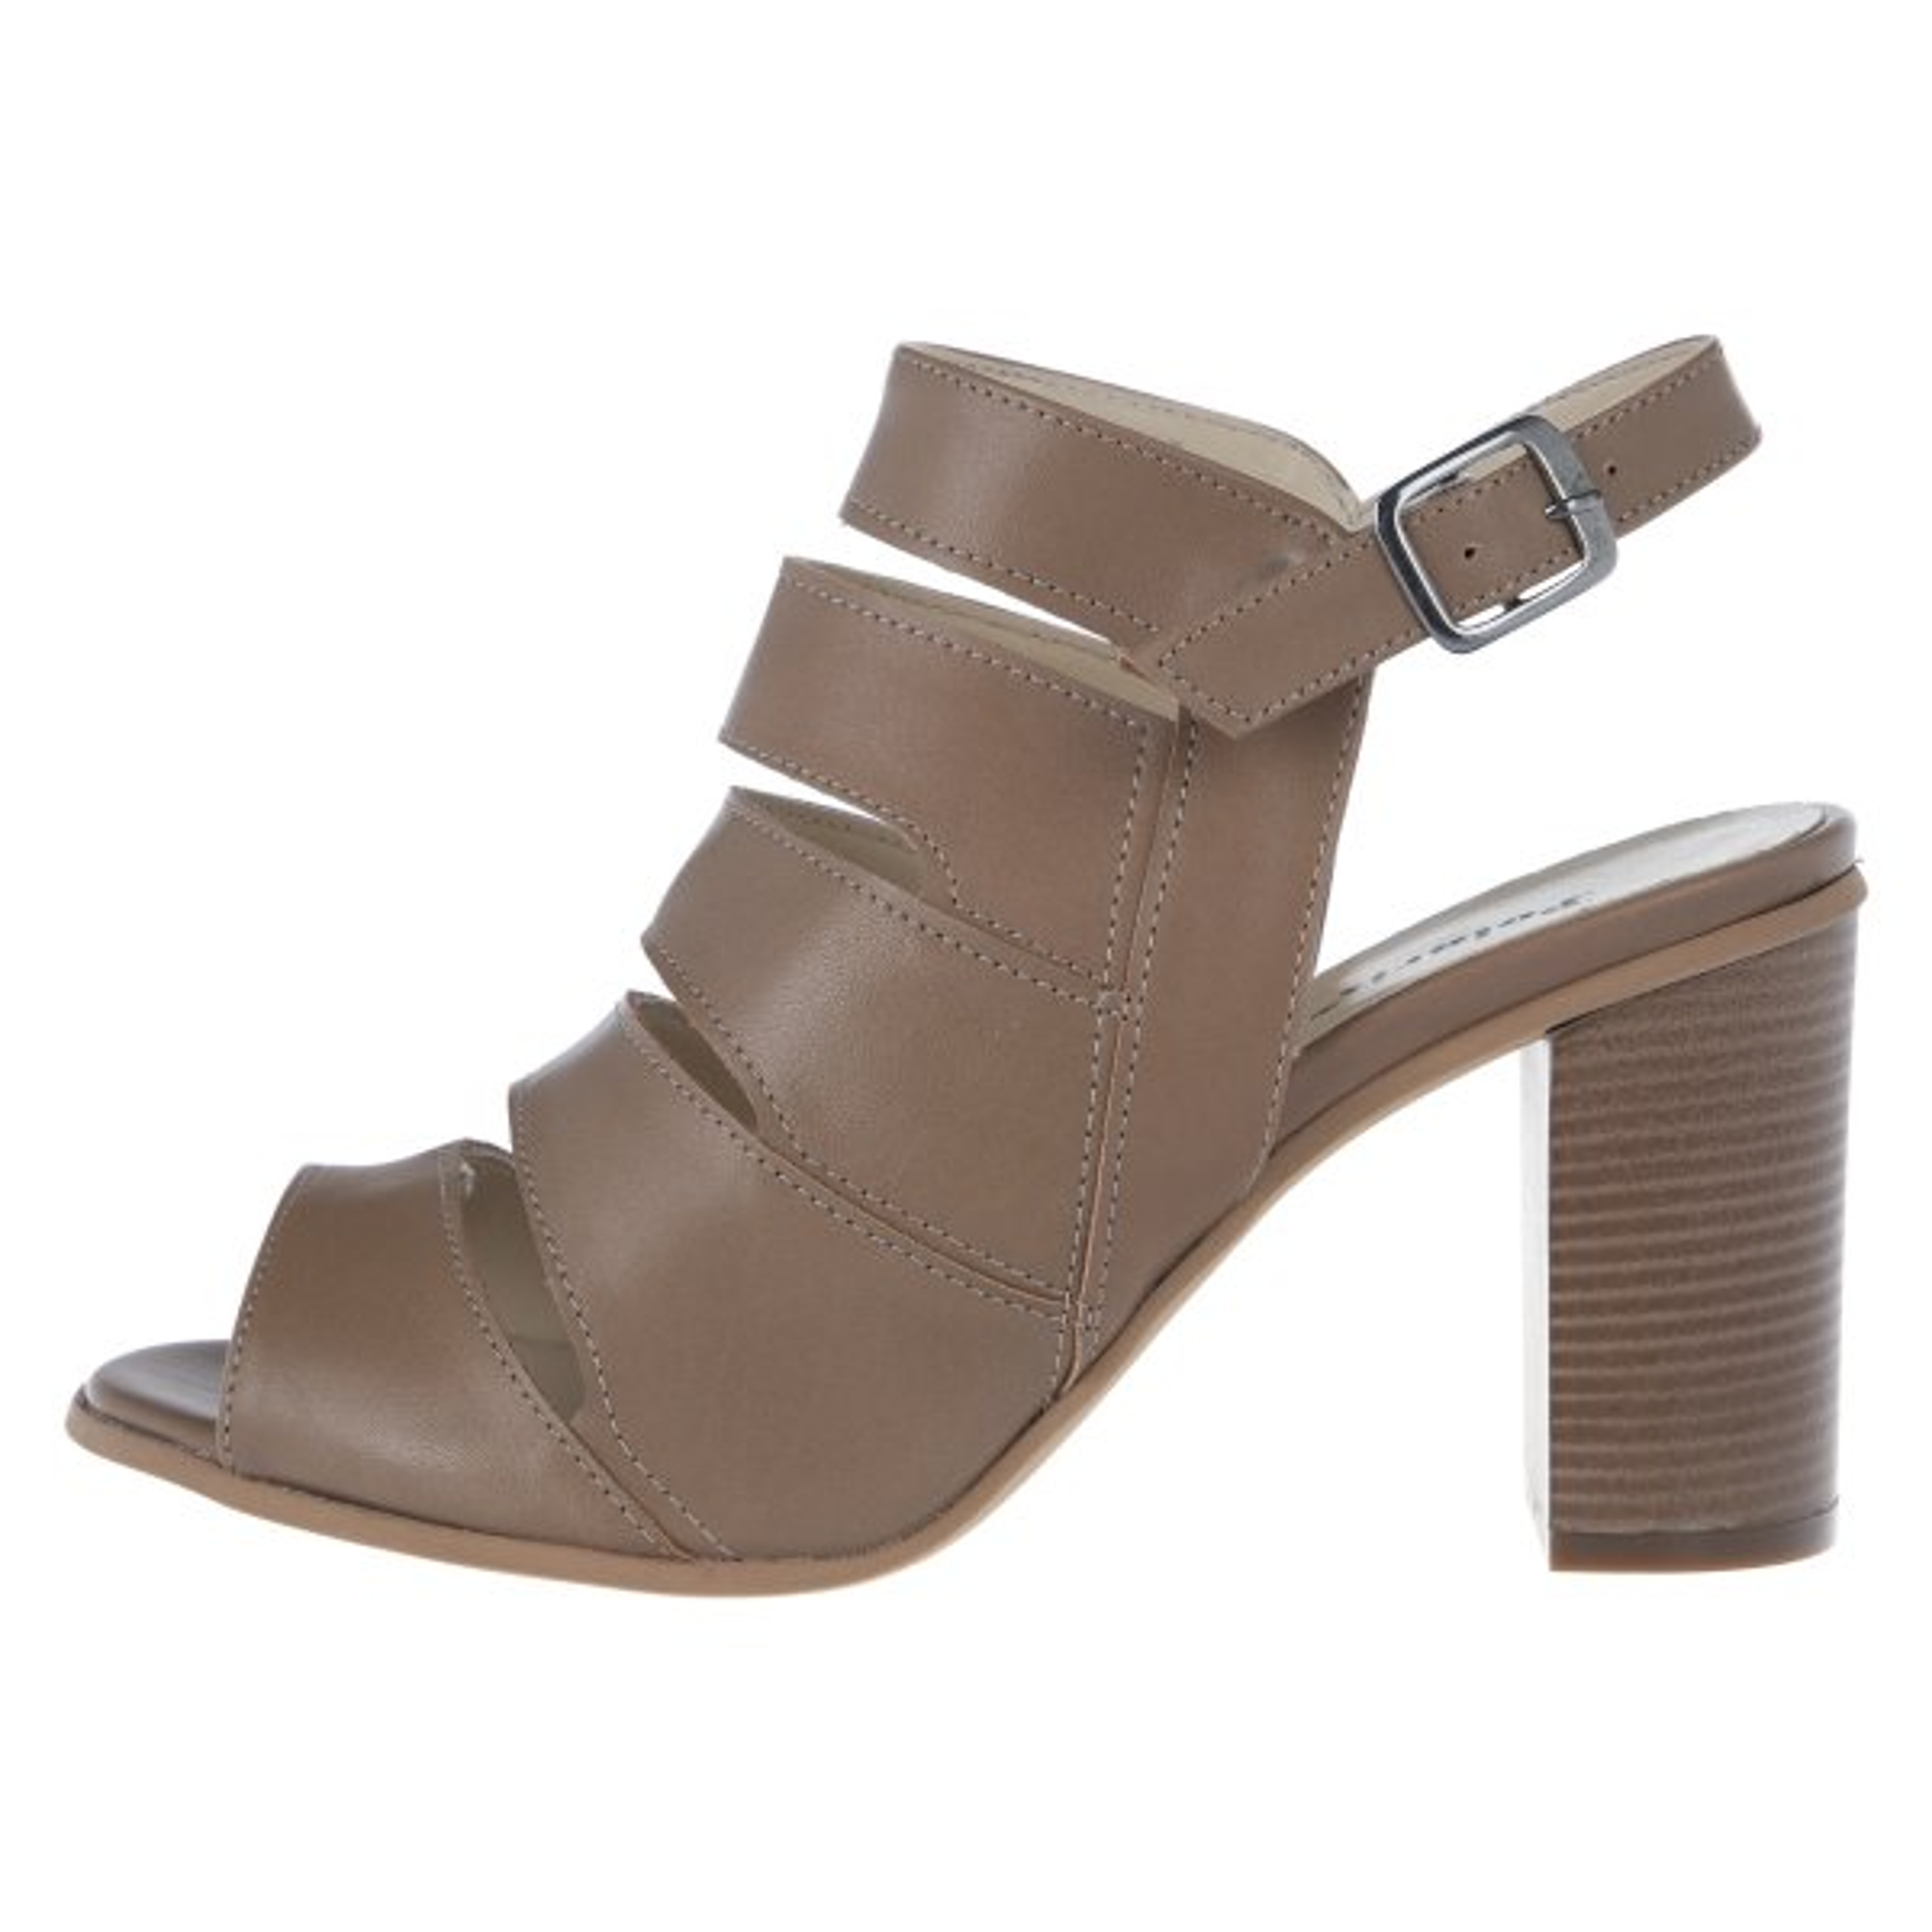 کفش زنانه پولاریس مدل 100294669-122